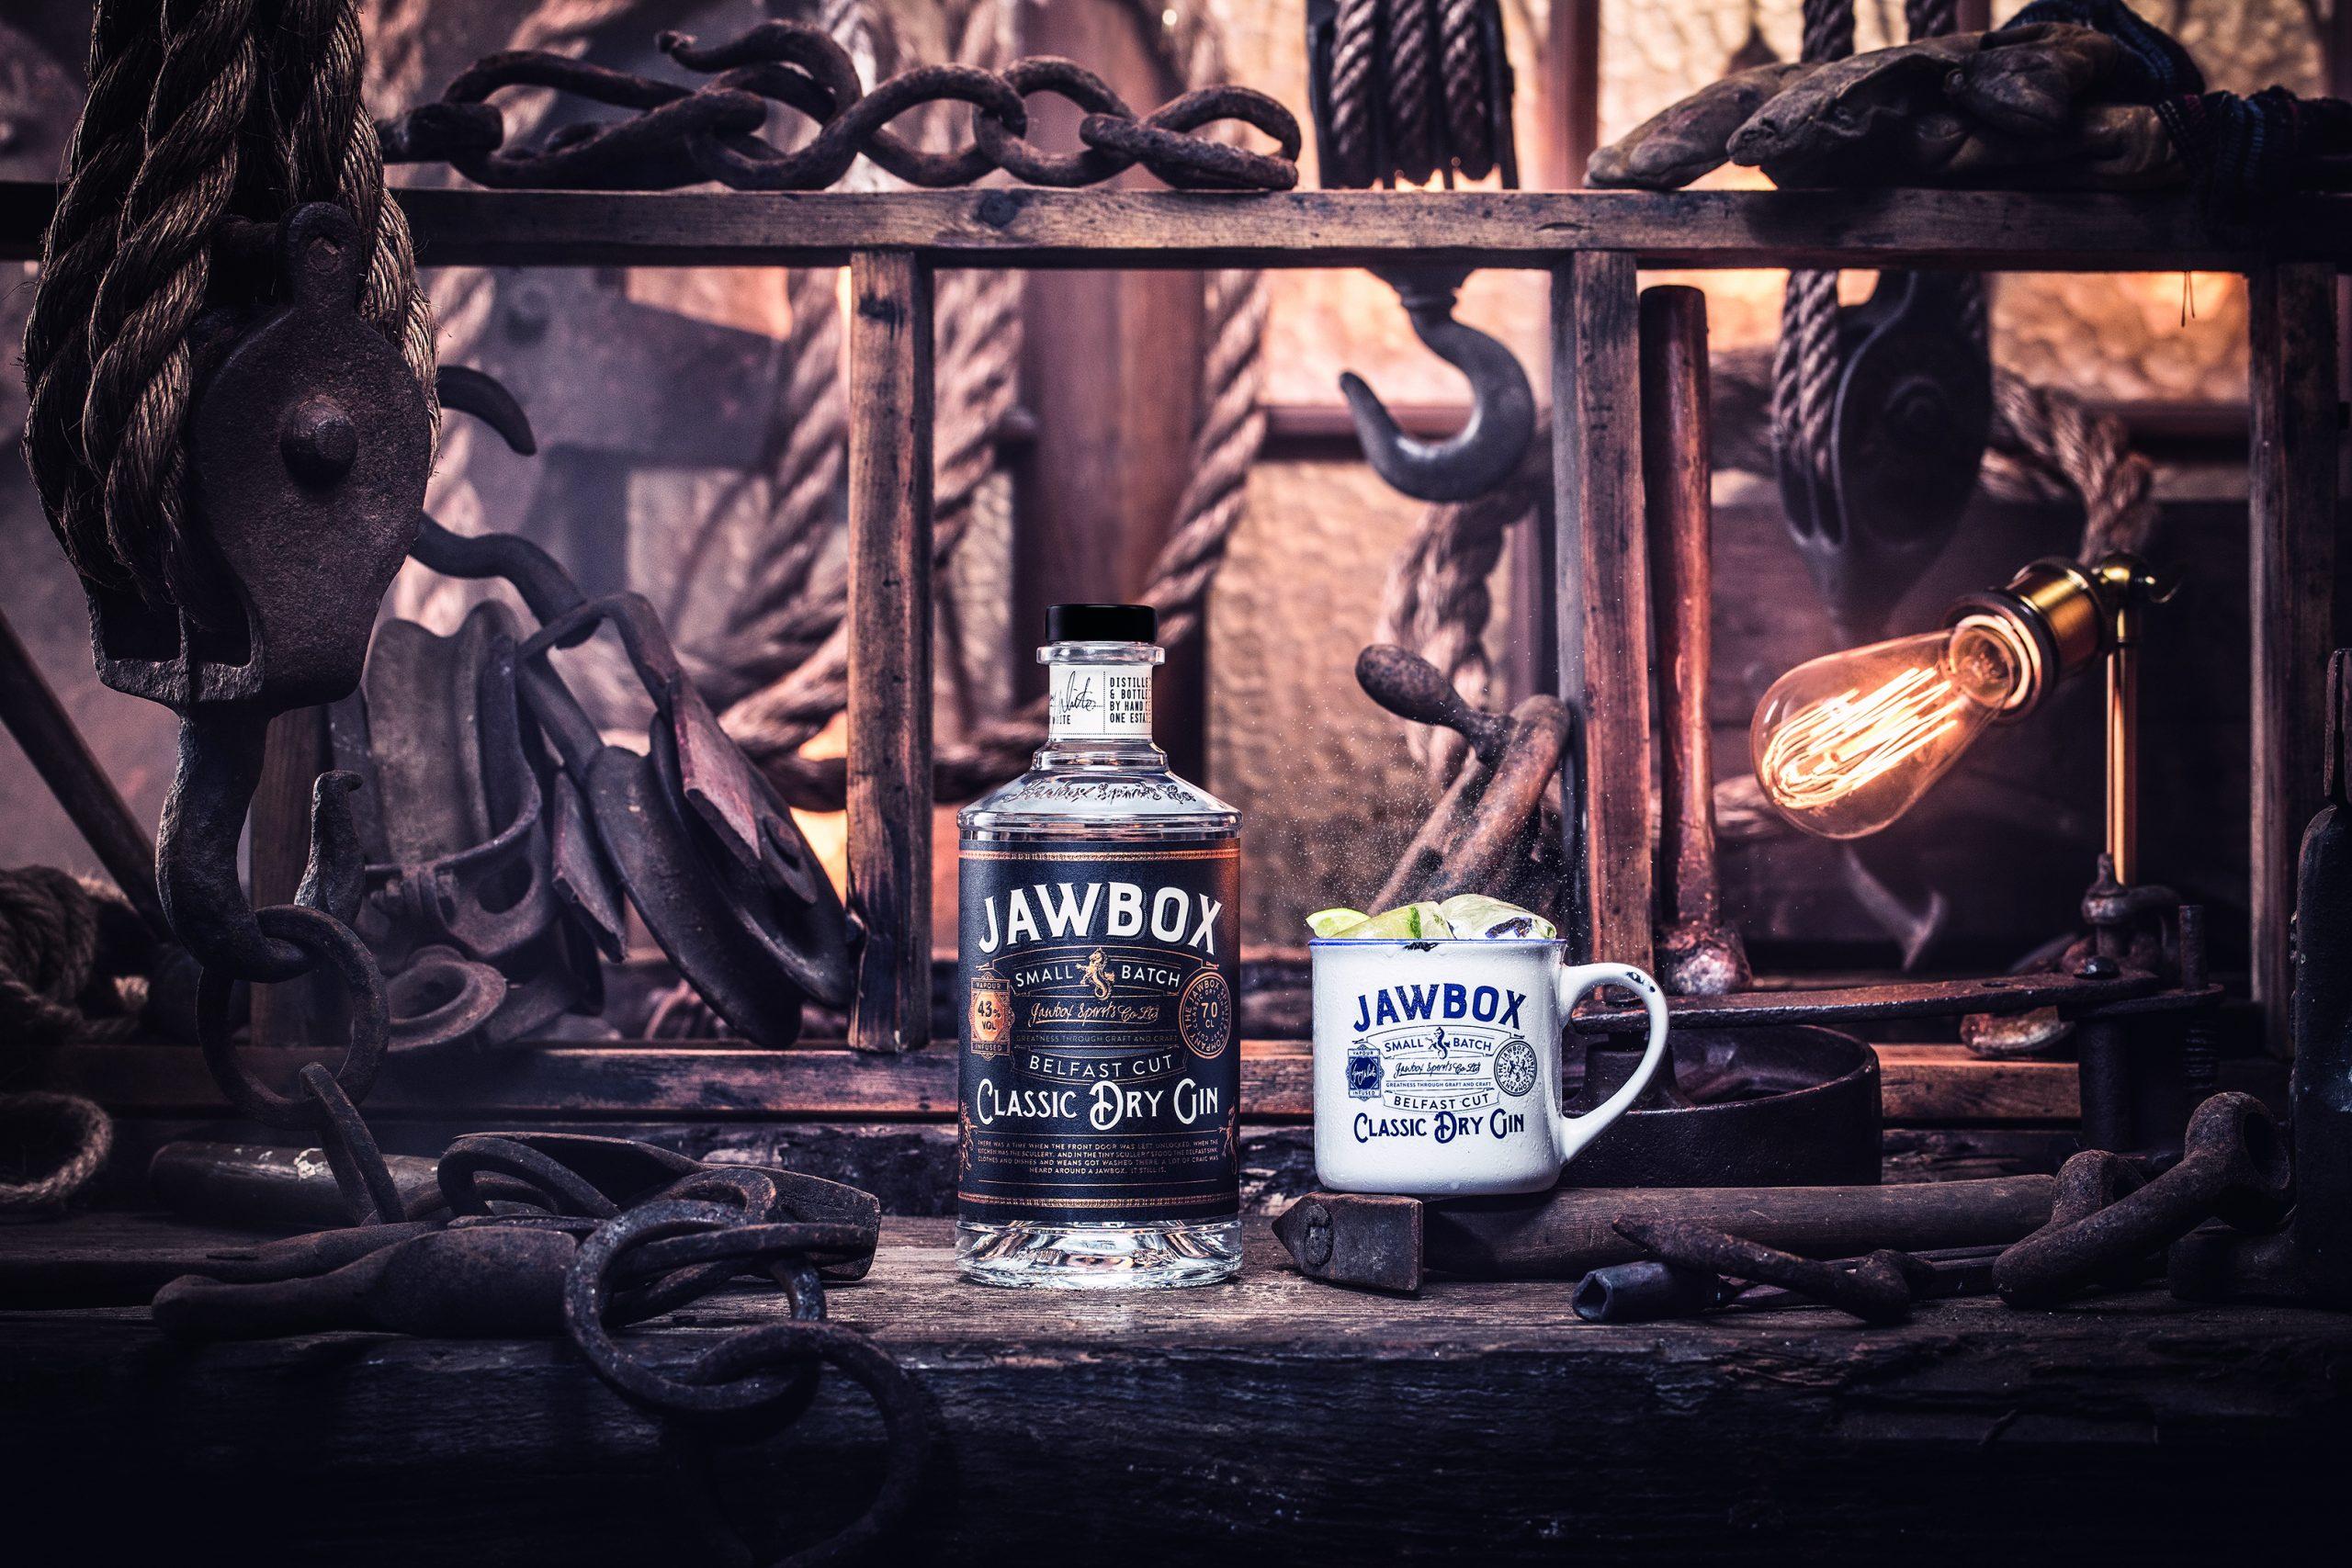 Jawbox Gin bottle and mug in warehouse setting